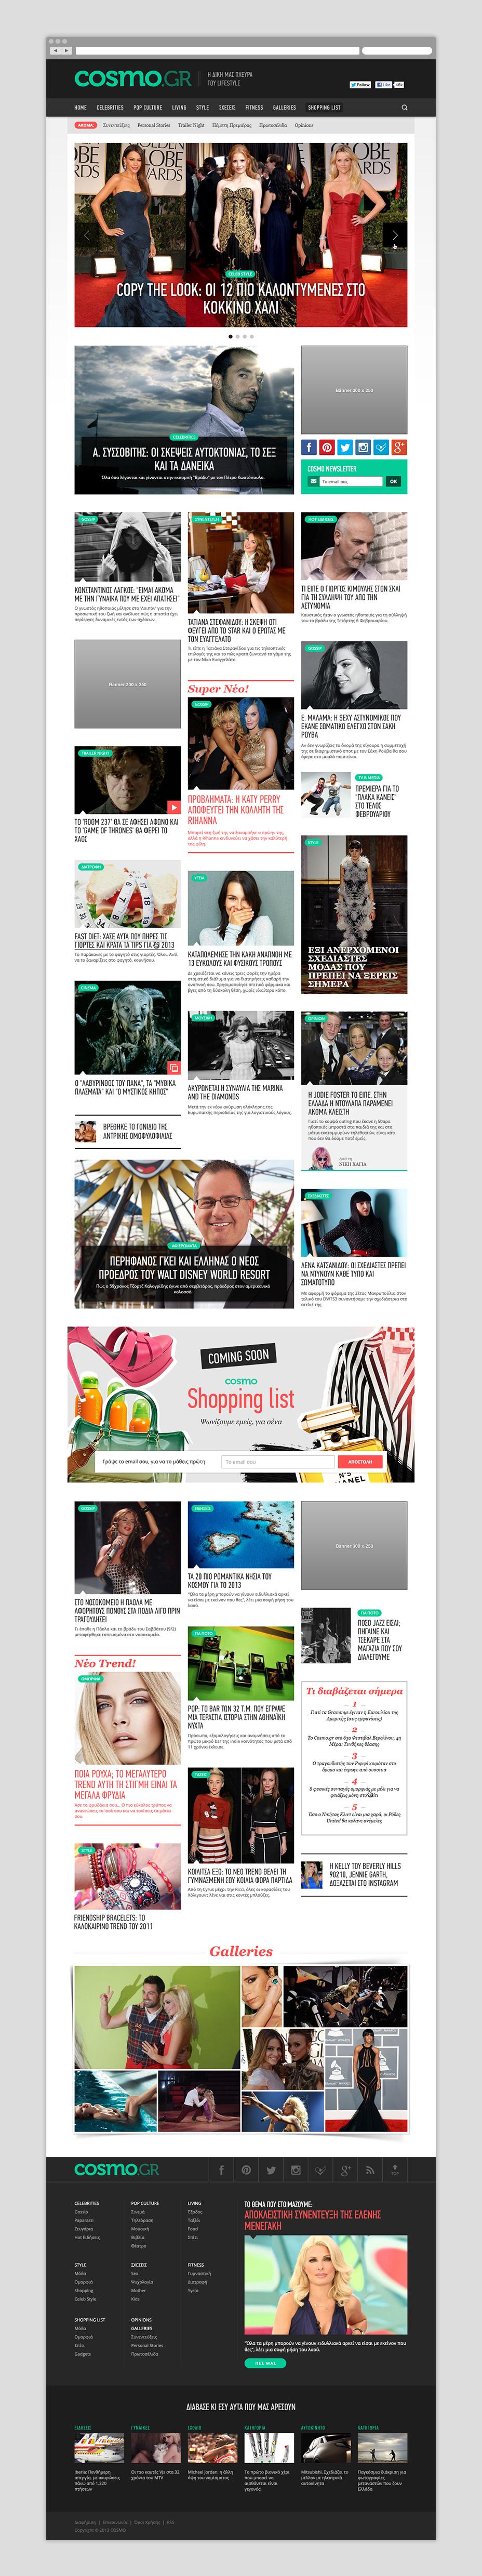 cosmogr-homepage-radial